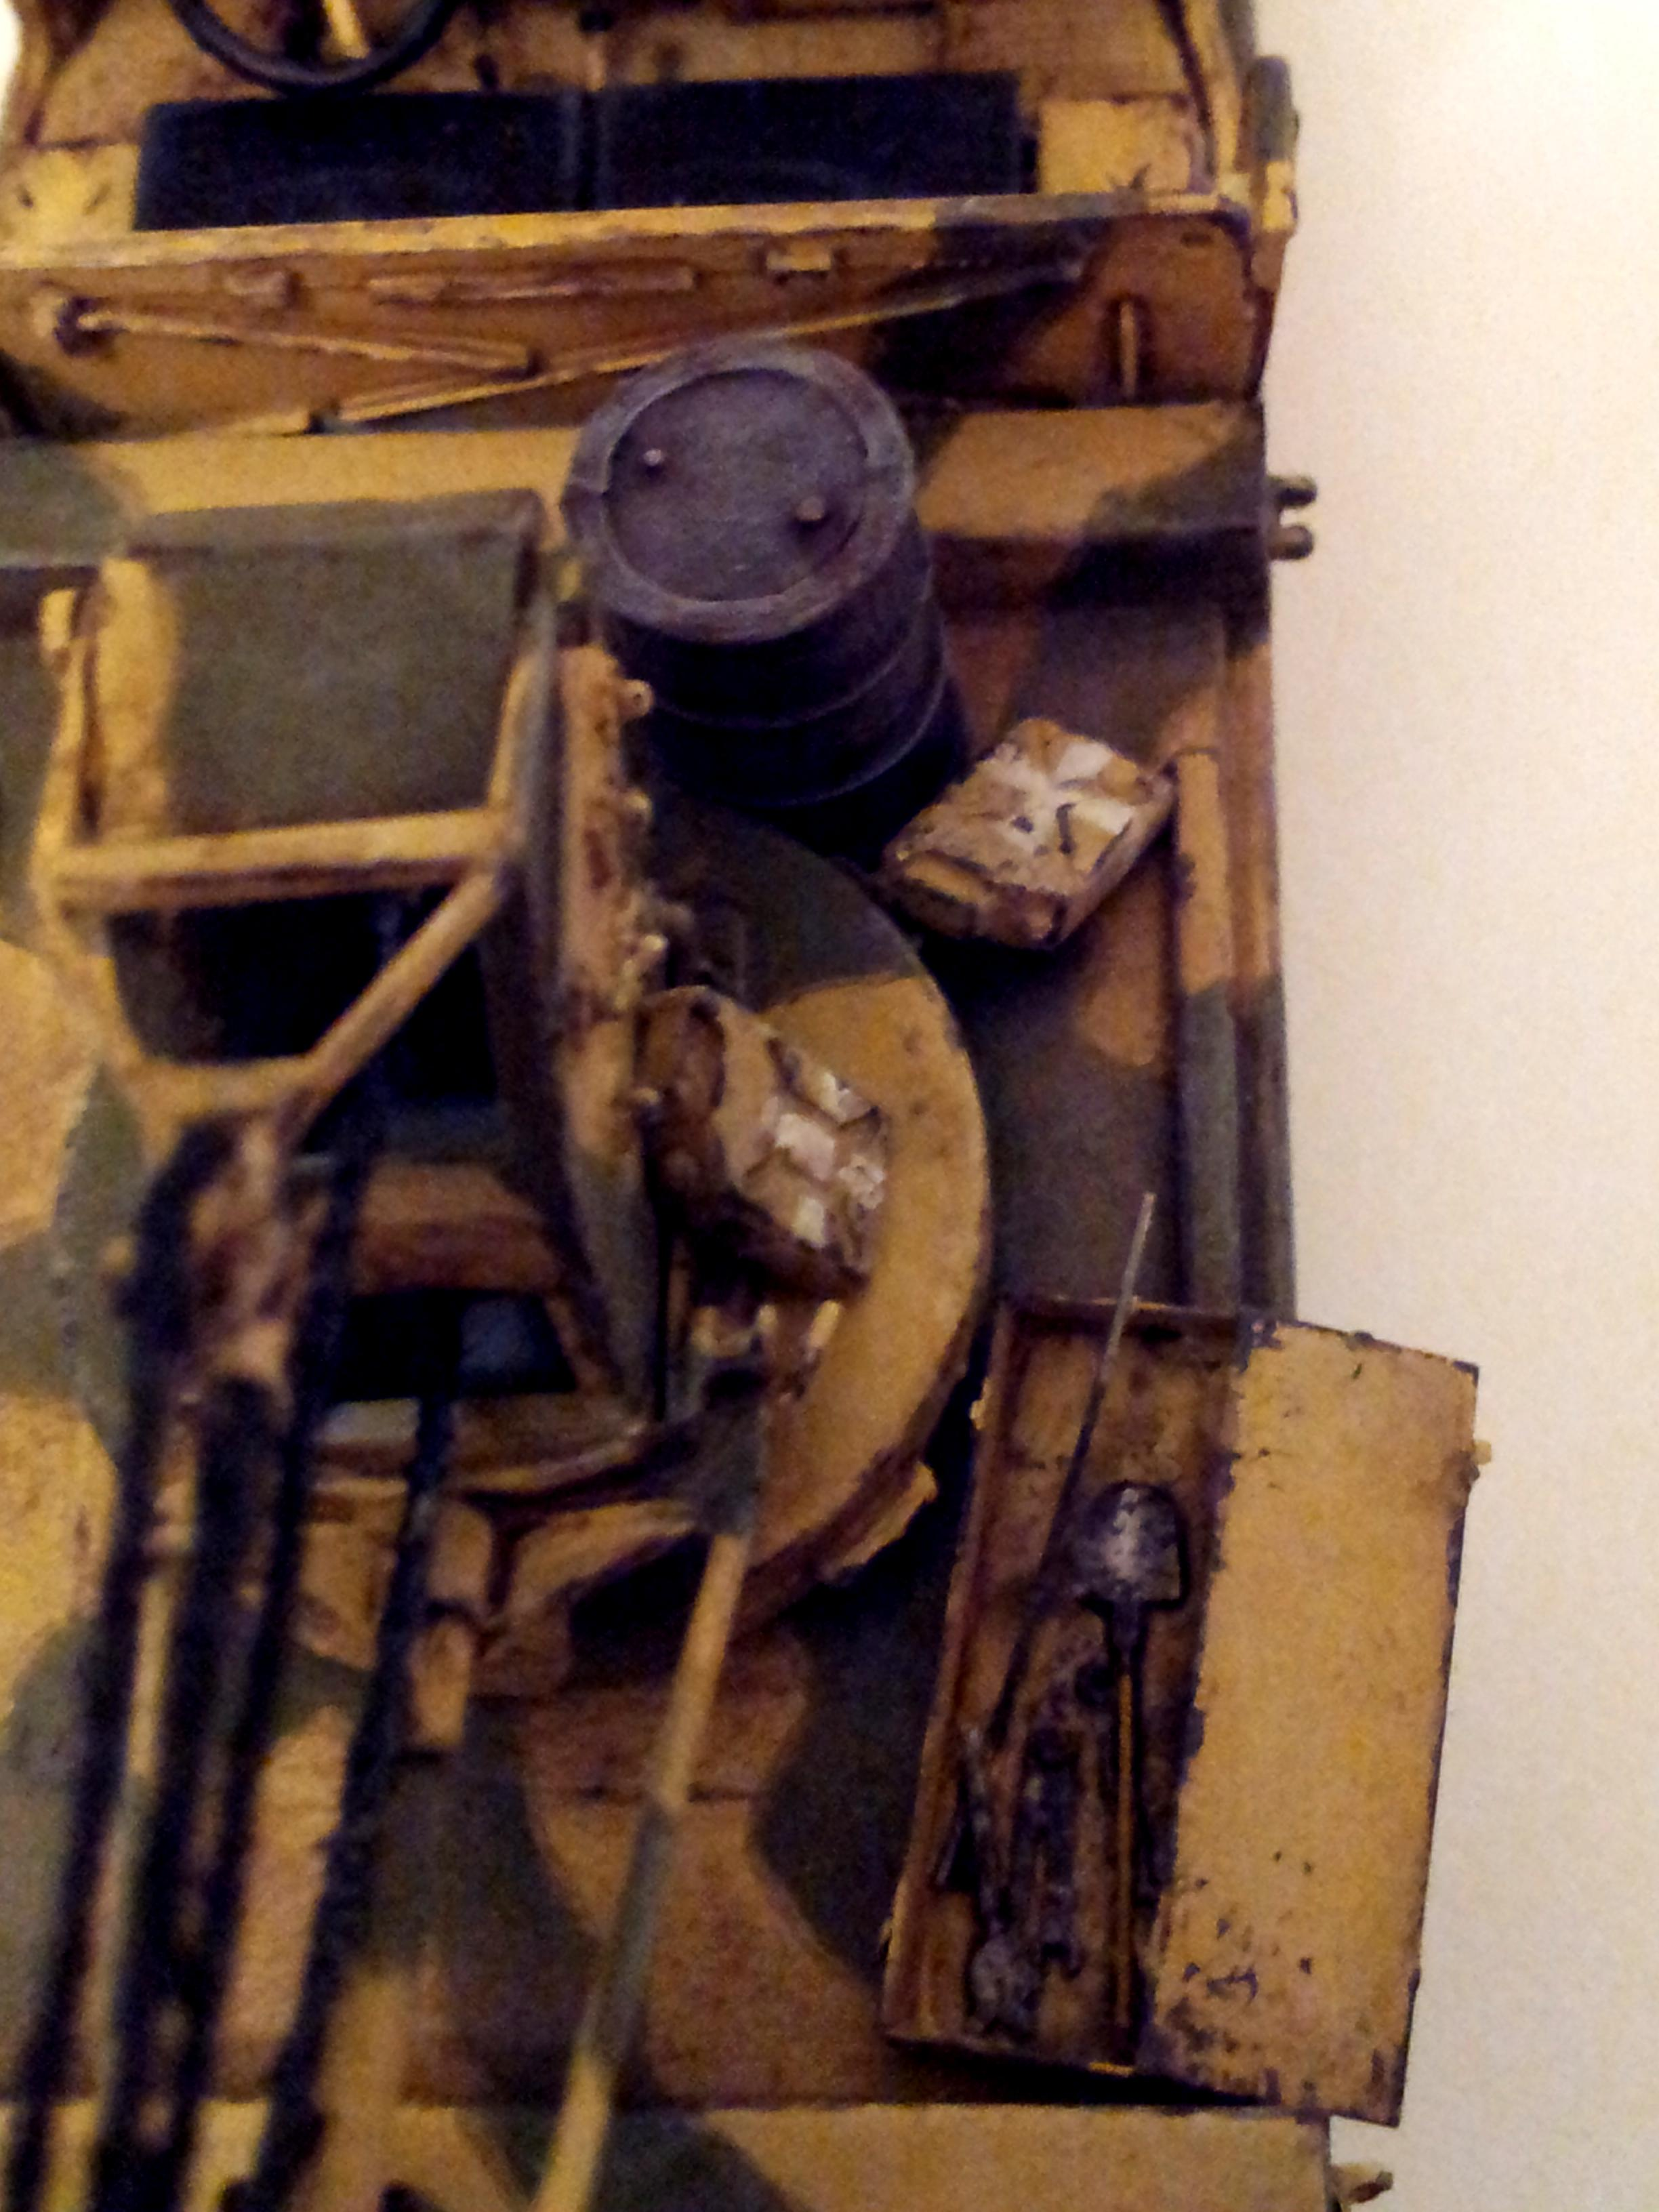 1/72, Famo' Sdkfz 9, Germans, Recovery Vehicle, World War 2